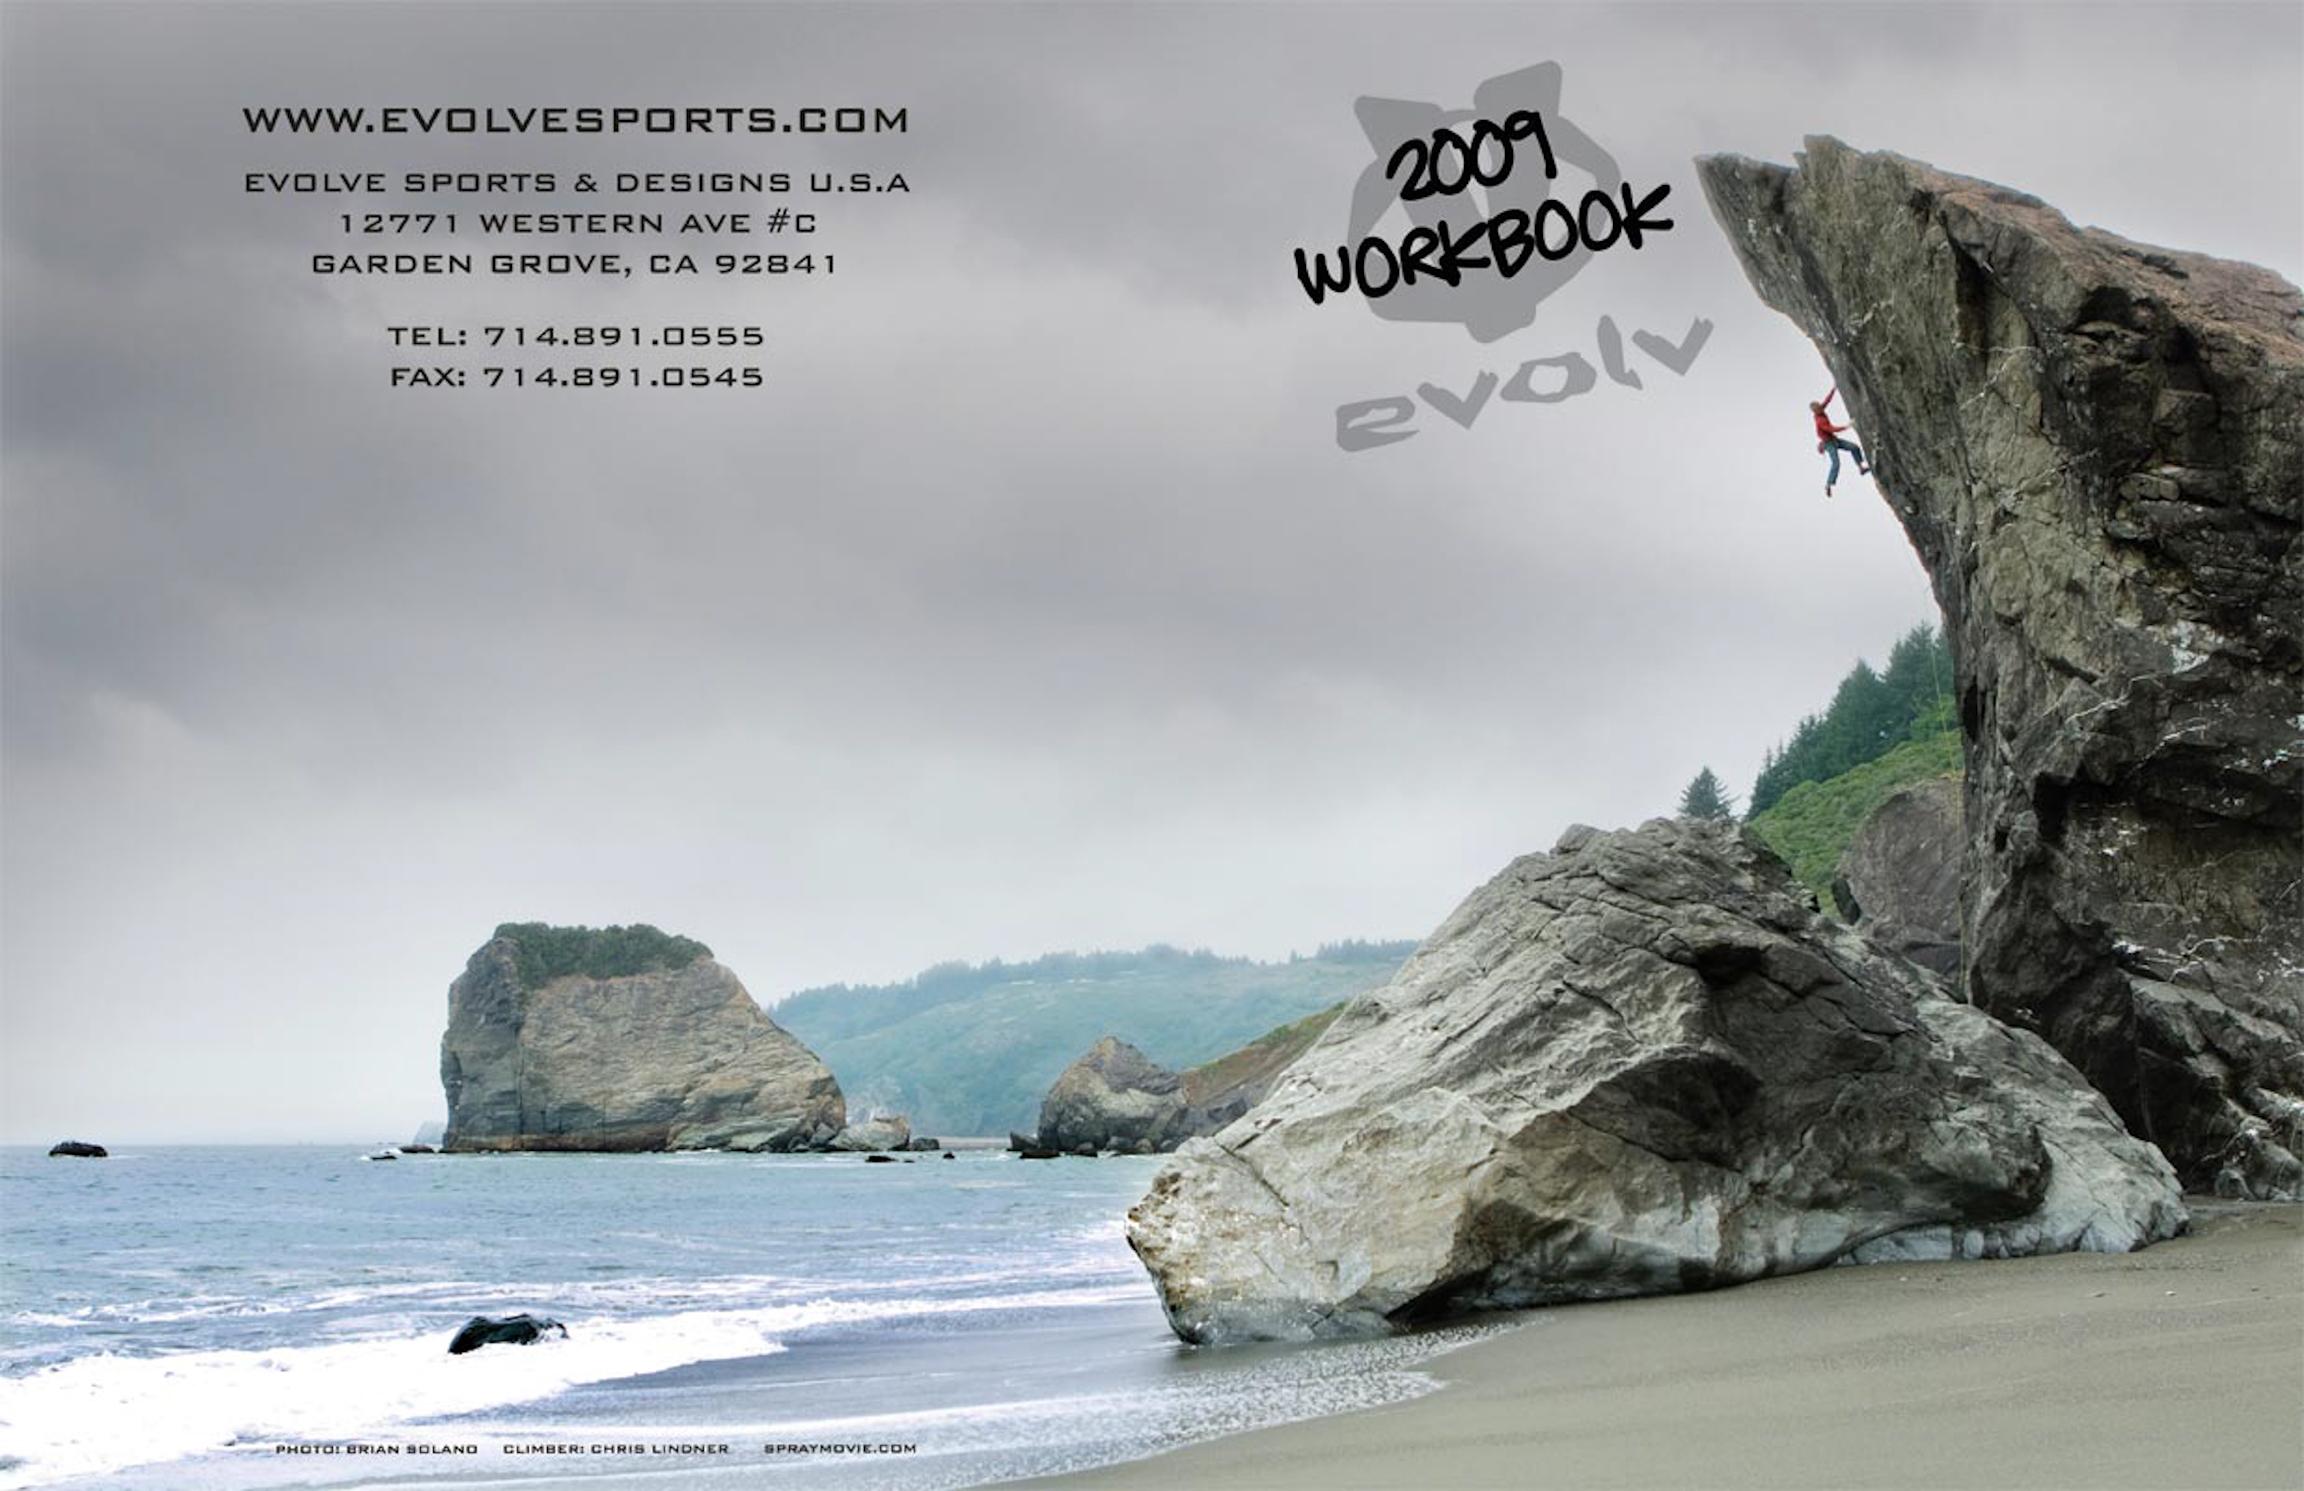 Evolve_Workbook08_L.jpg